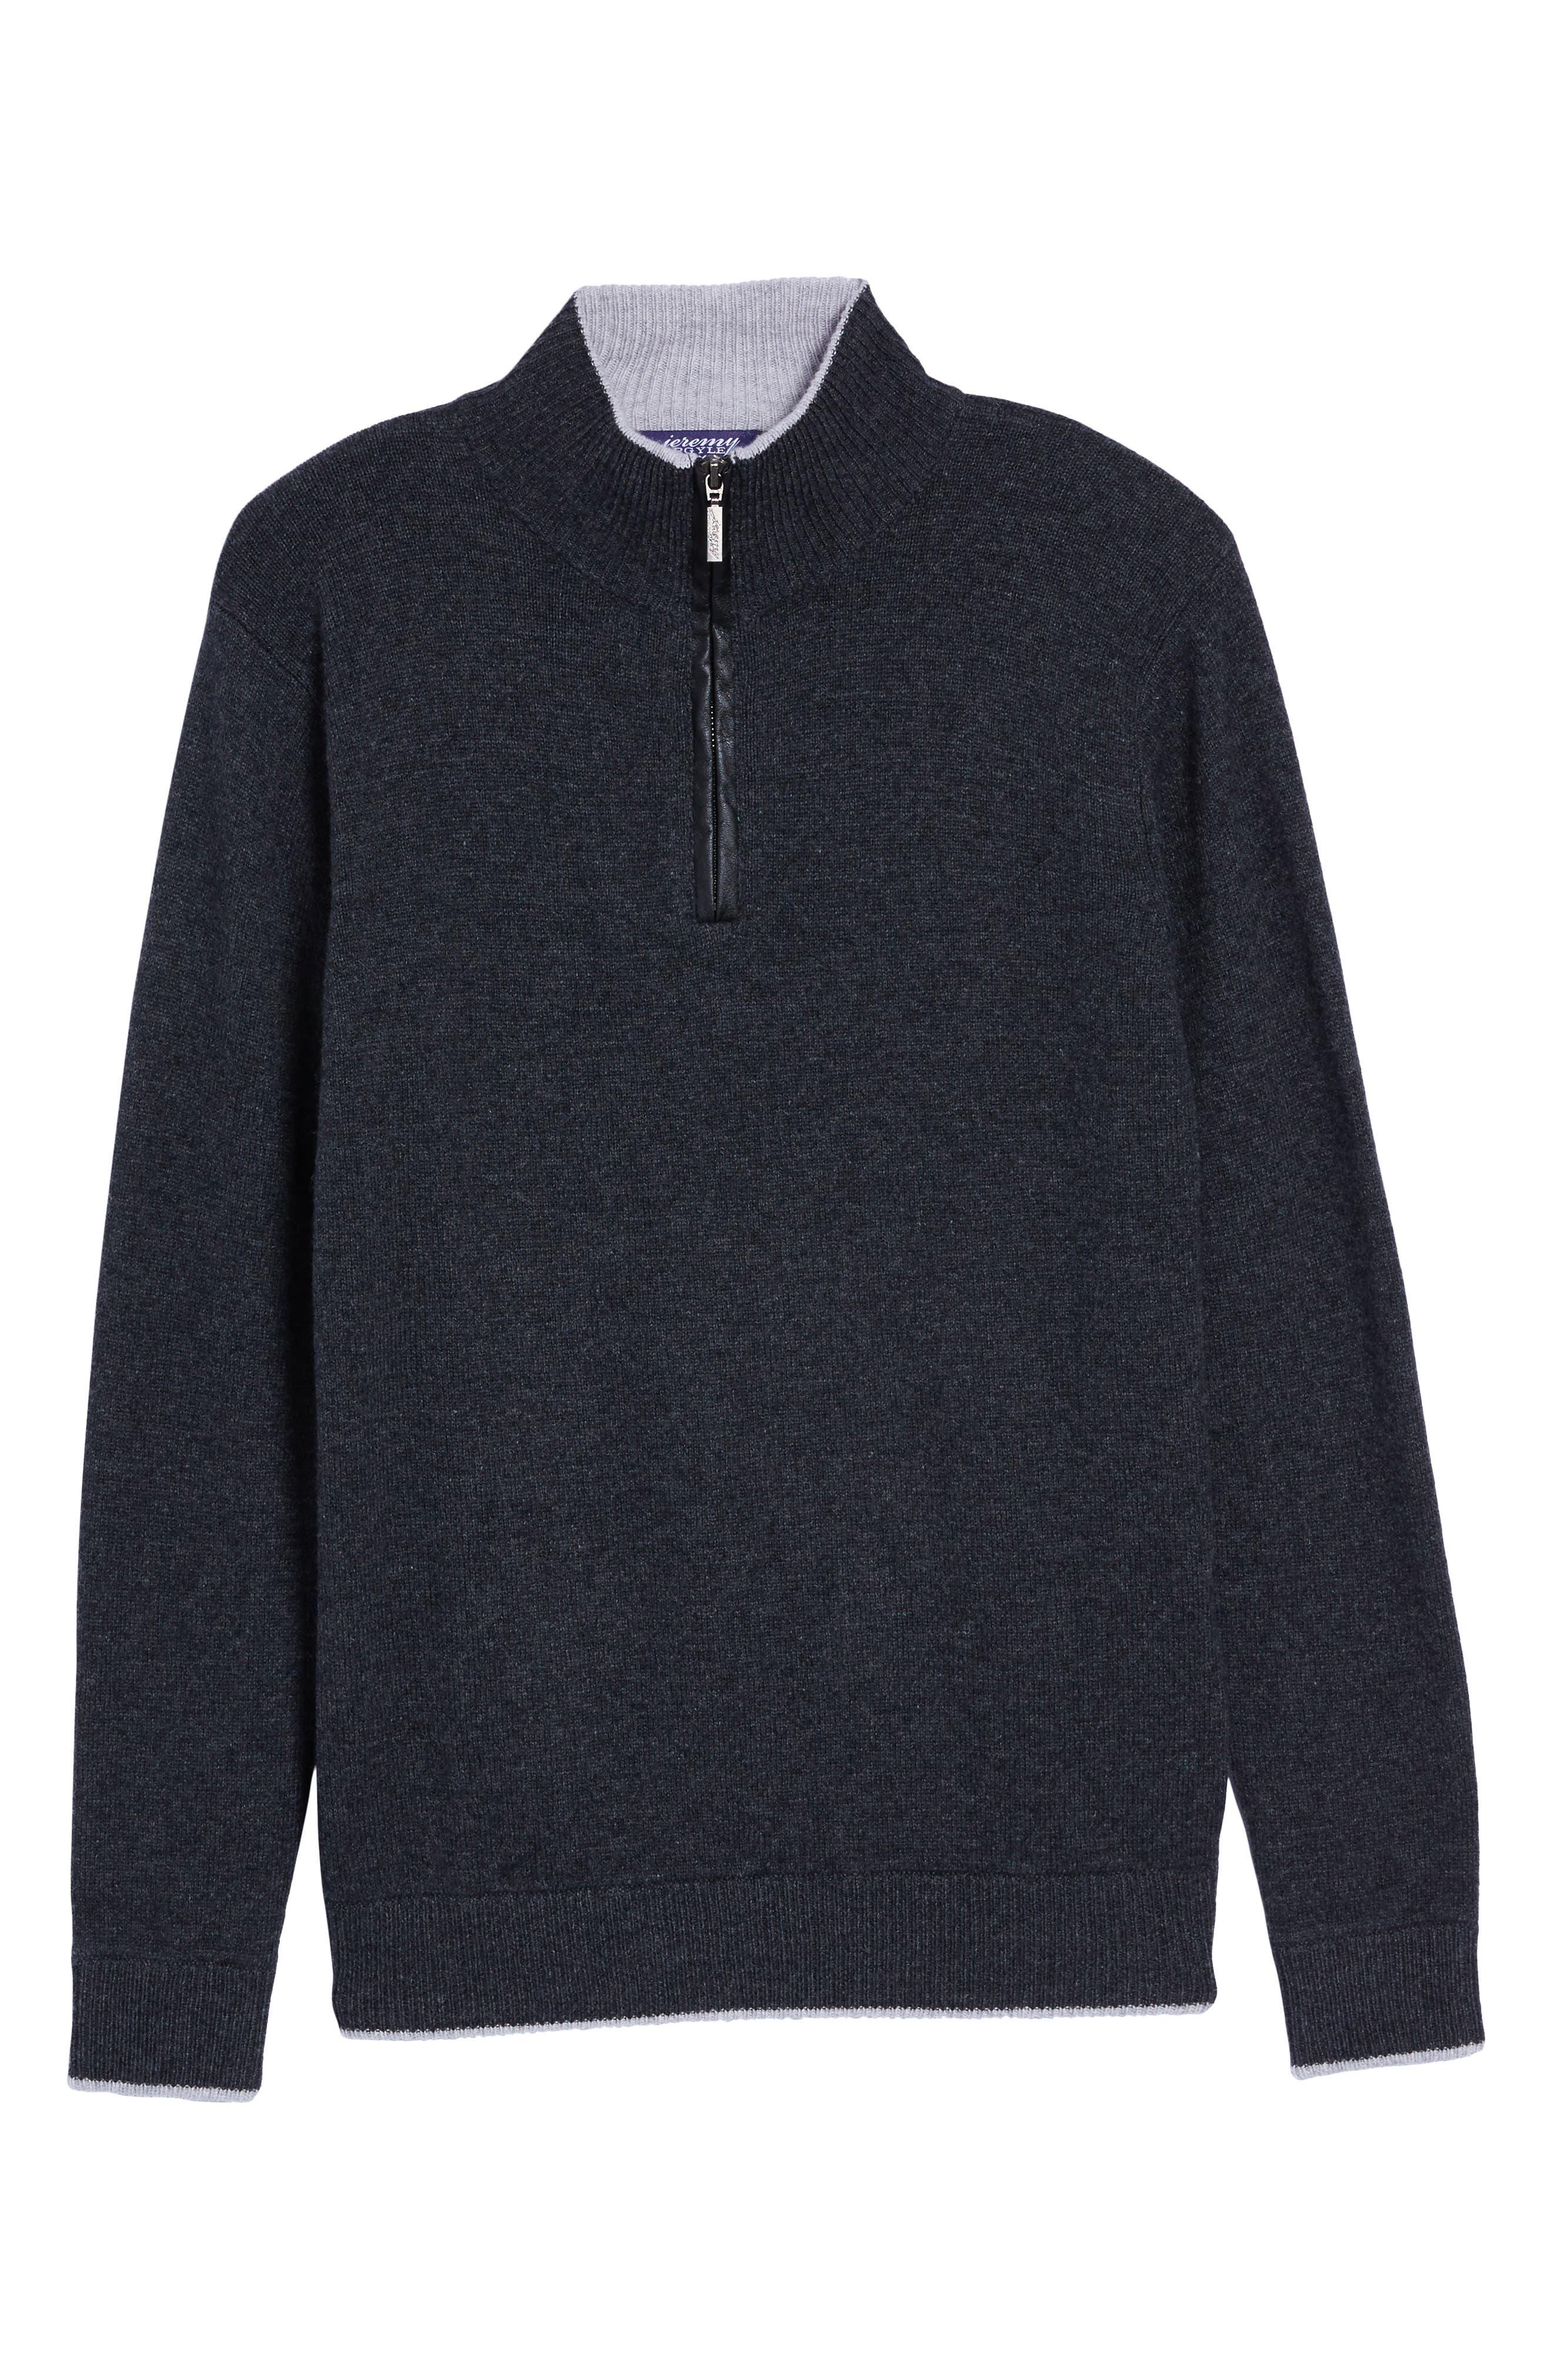 Wool Blend Quarter Zip Sweater,                             Alternate thumbnail 6, color,                             Dark Grey